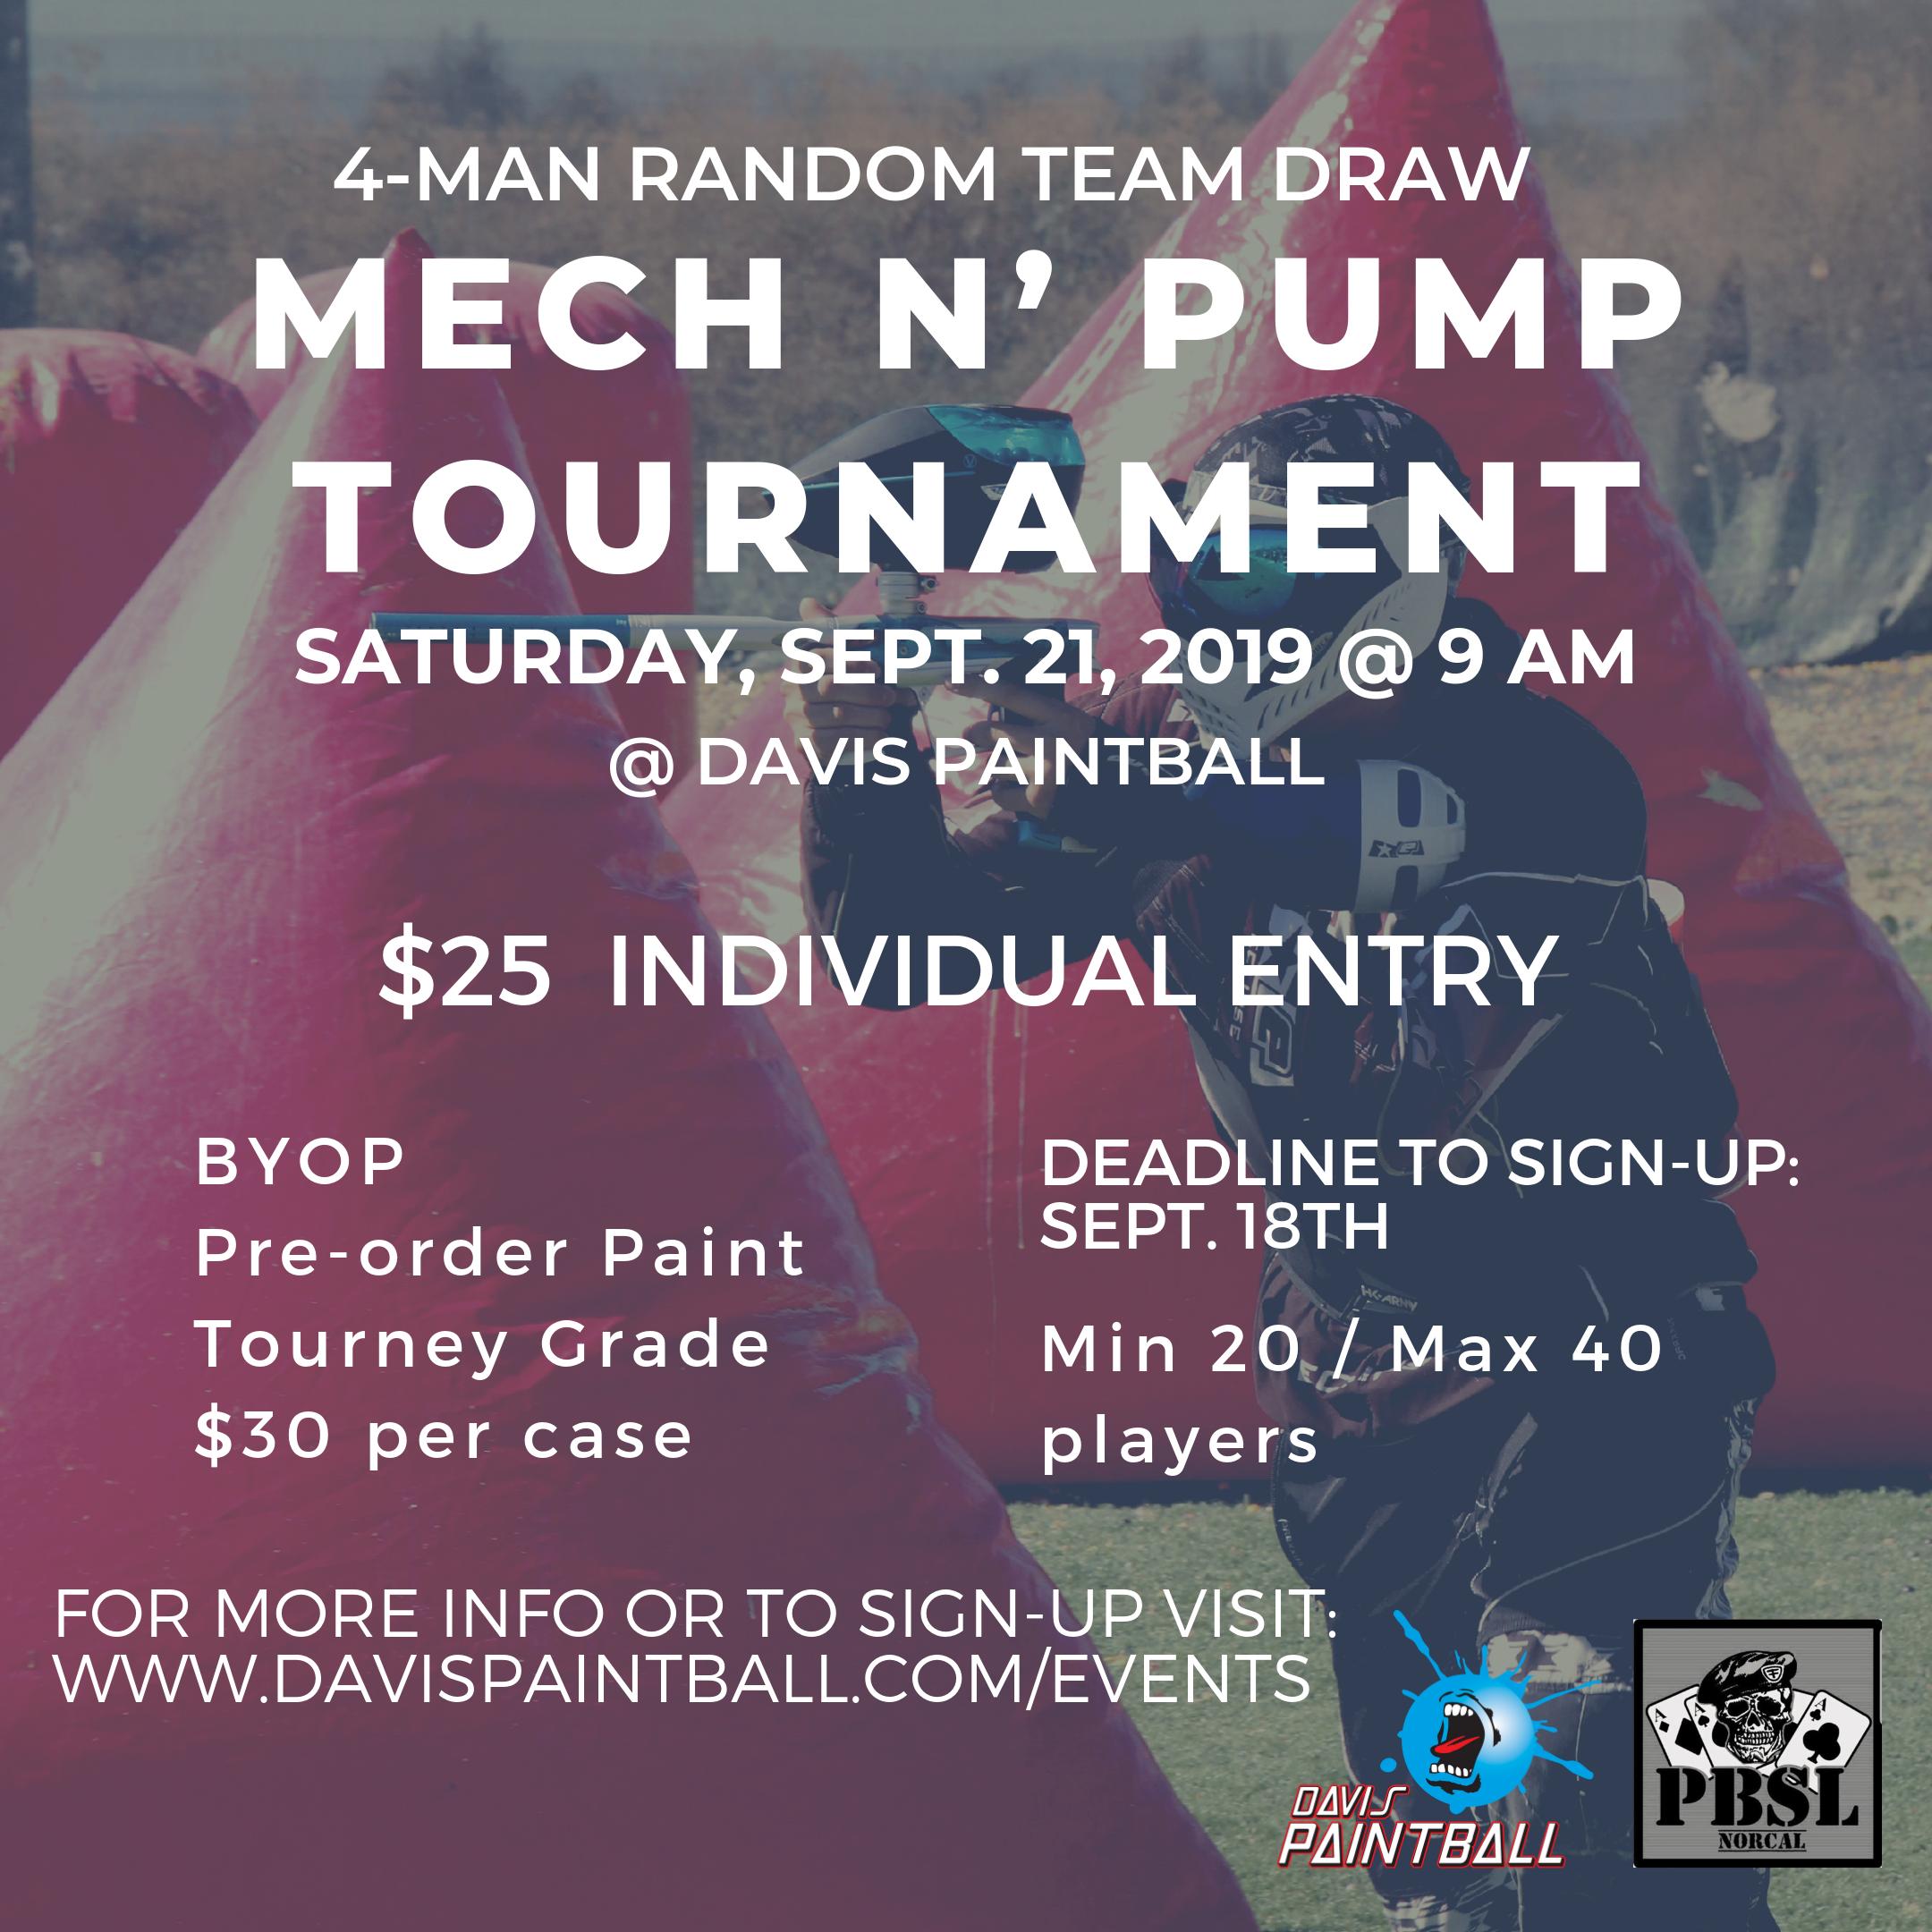 Mech n' pump tournament.png